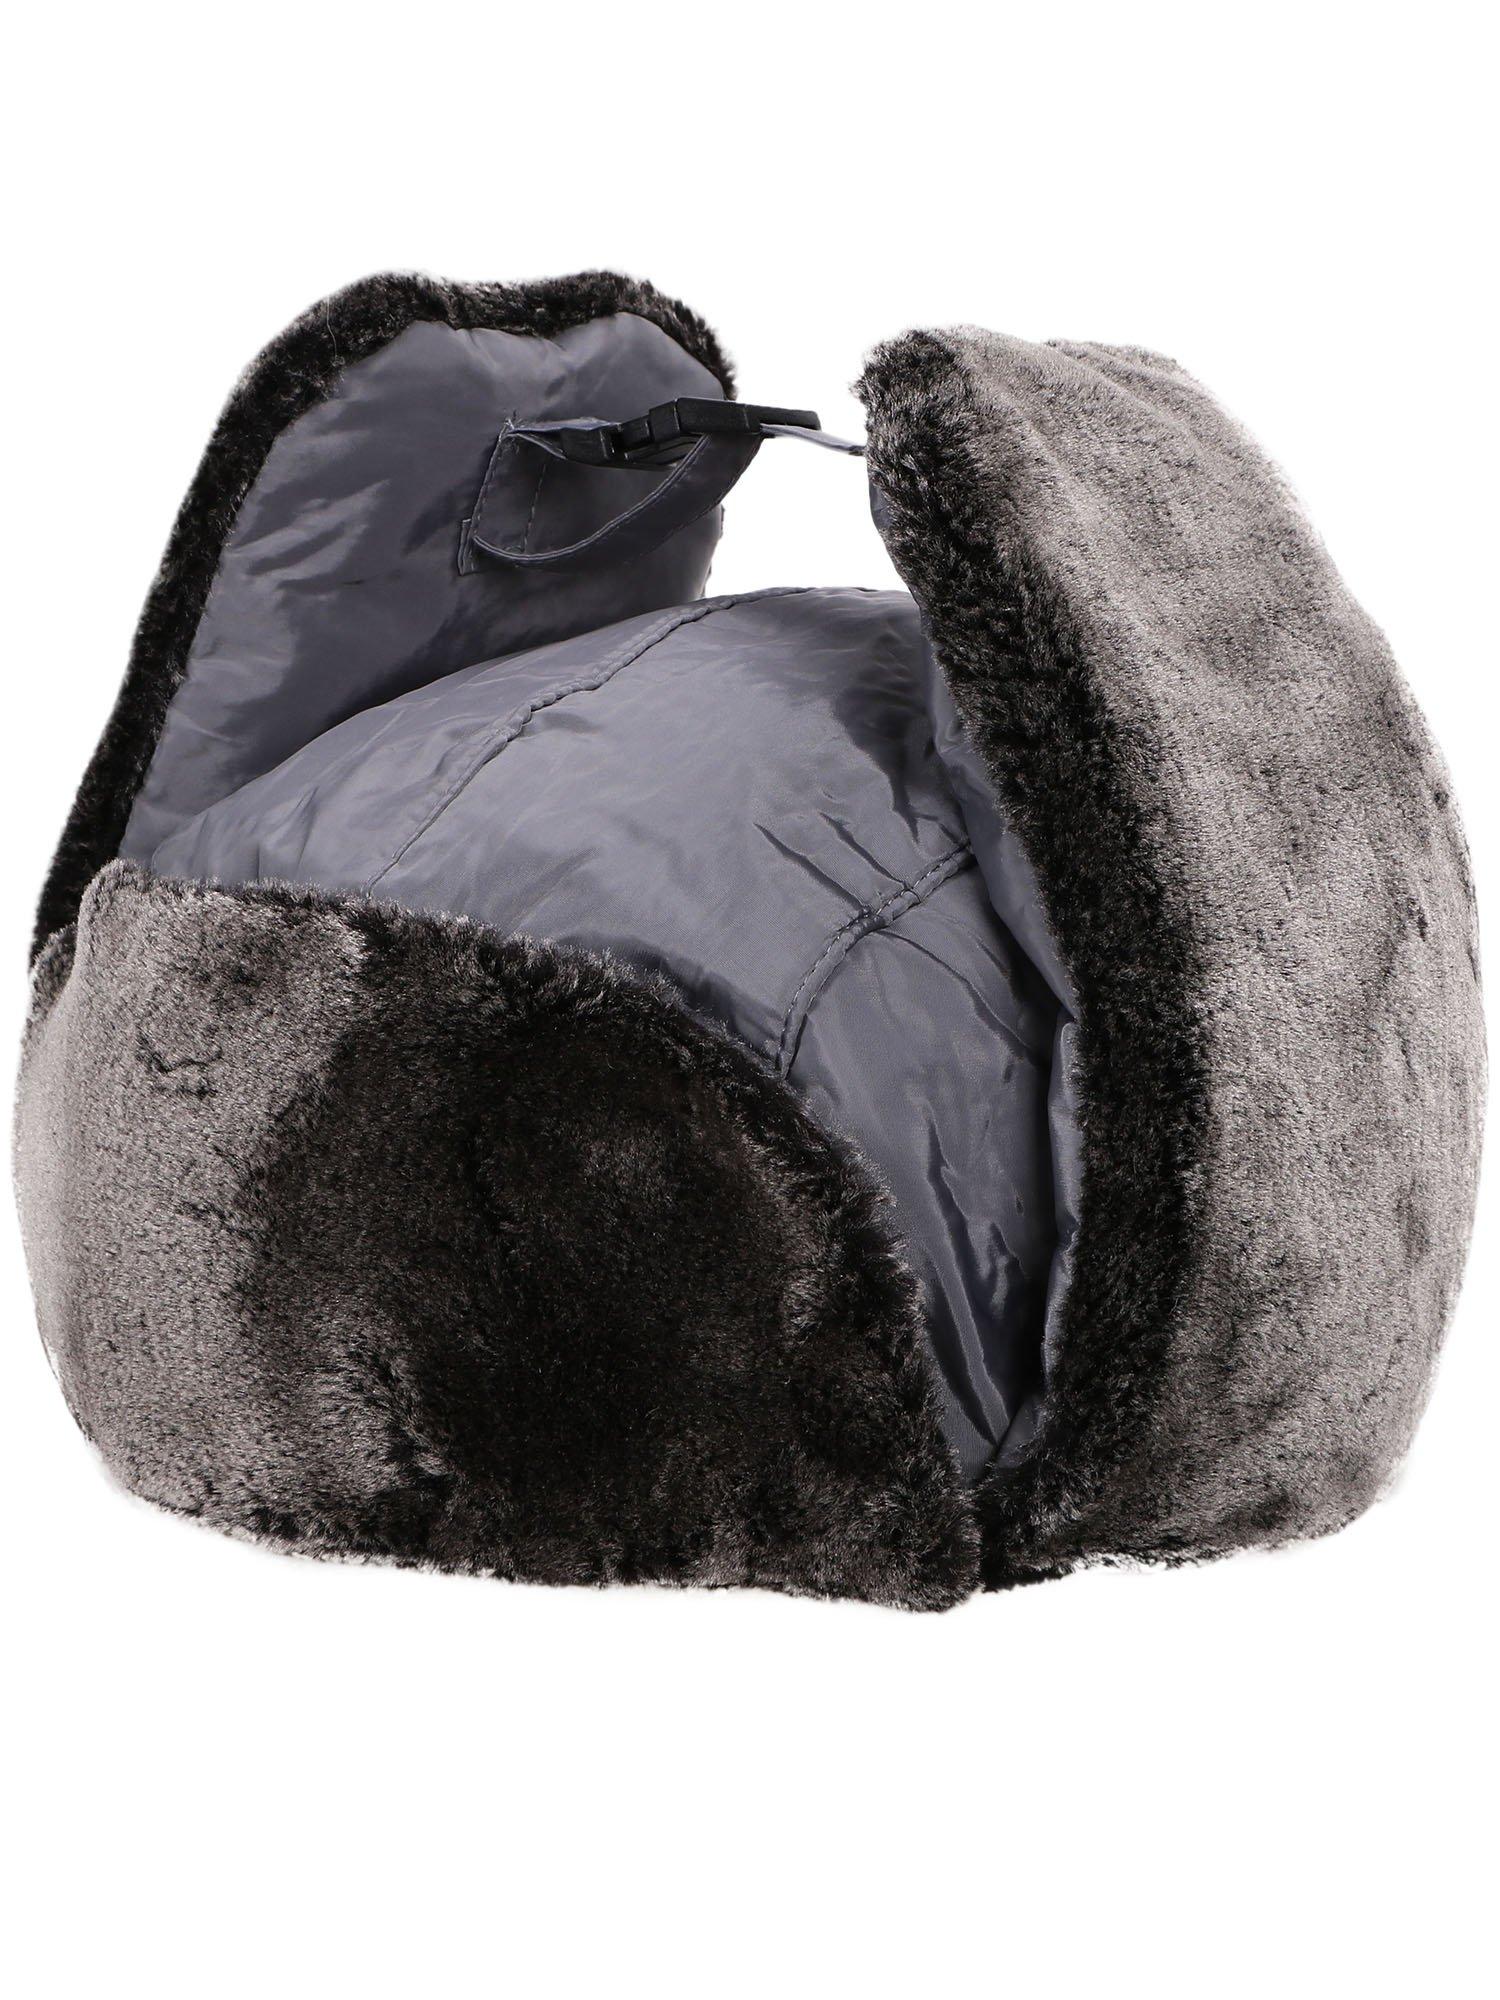 Verabella Winter Faux Fur Outdoor Trapper Cap Ushanka Russian Hats Windproof Facemask